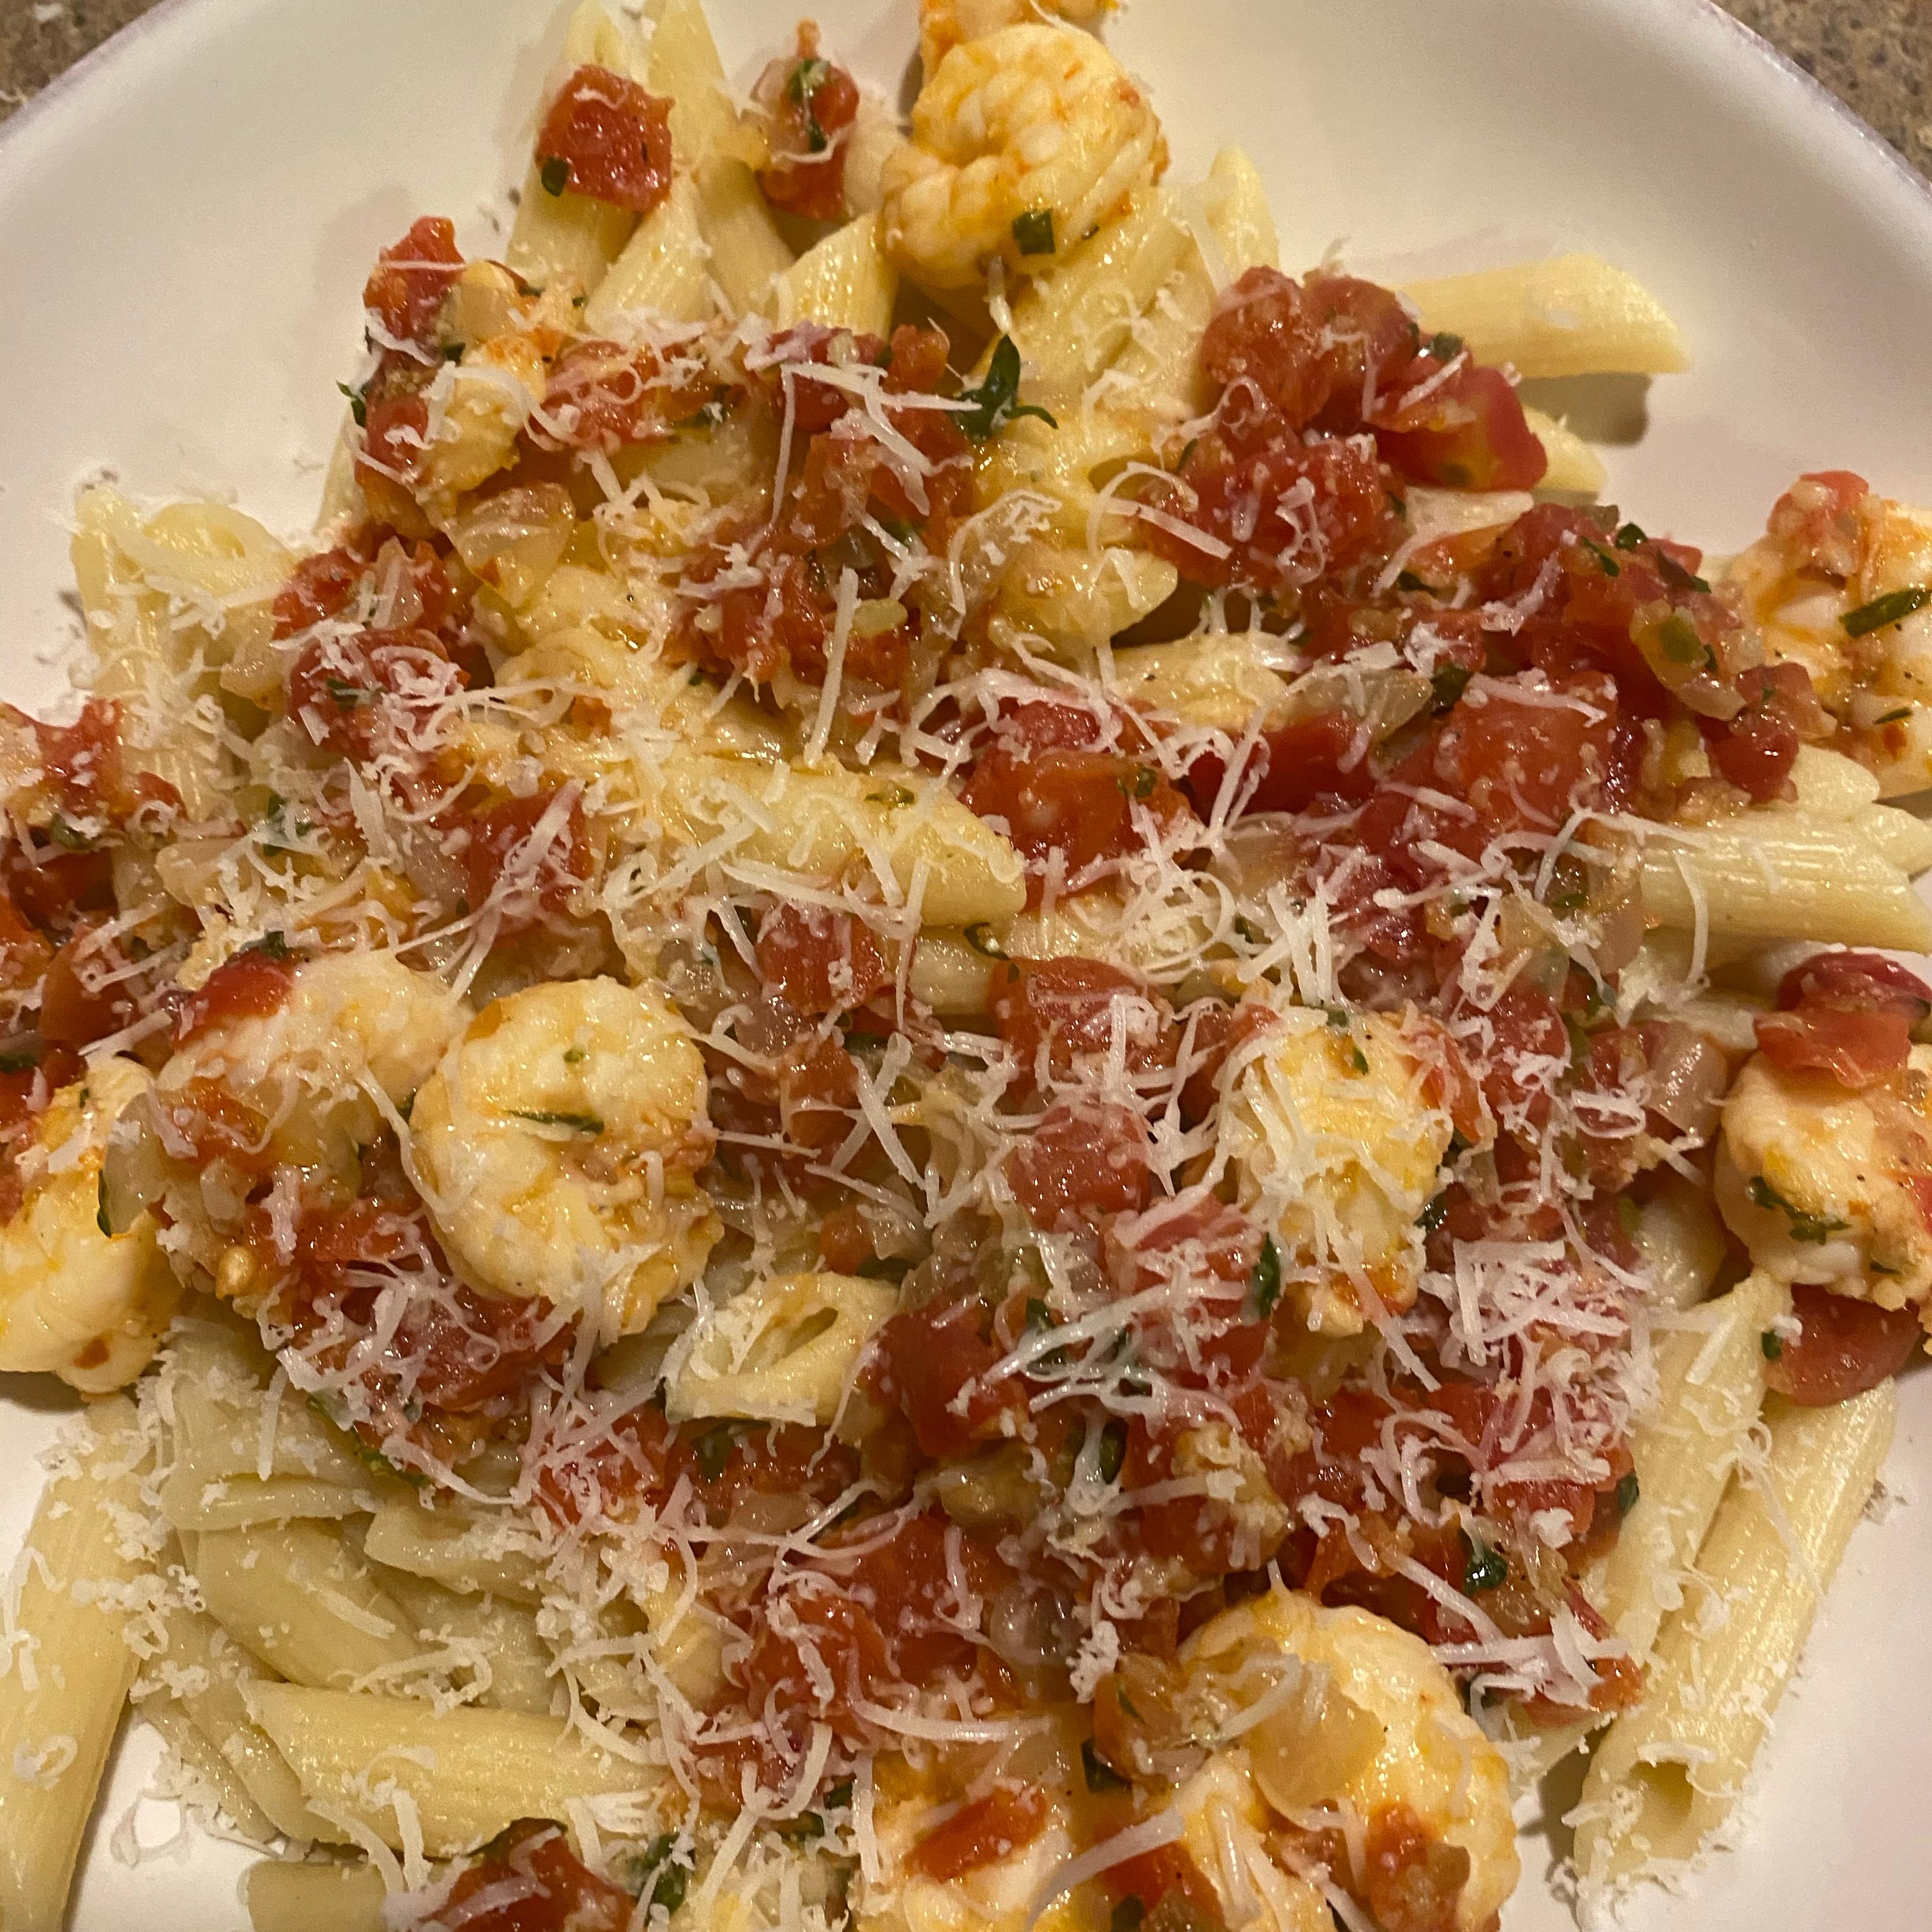 Spicy Shrimp and Tomato Scampi